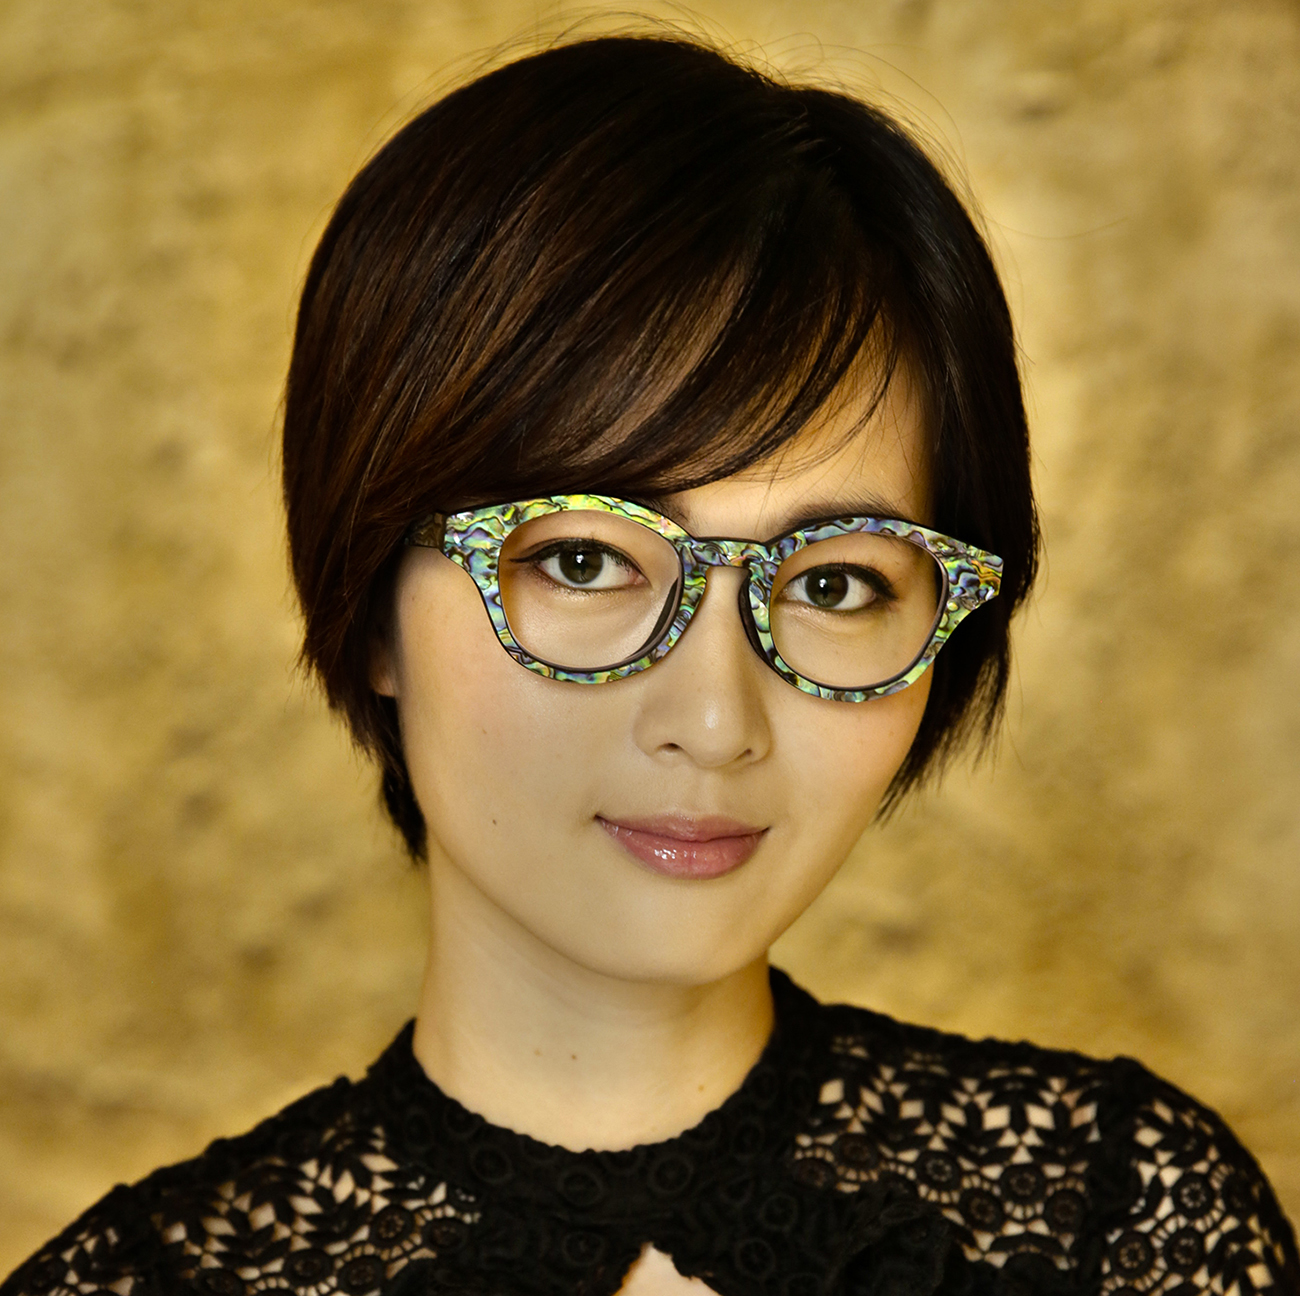 Custom glasses made by the 3DNA Eyewear system. Photo via Eye-DNA.